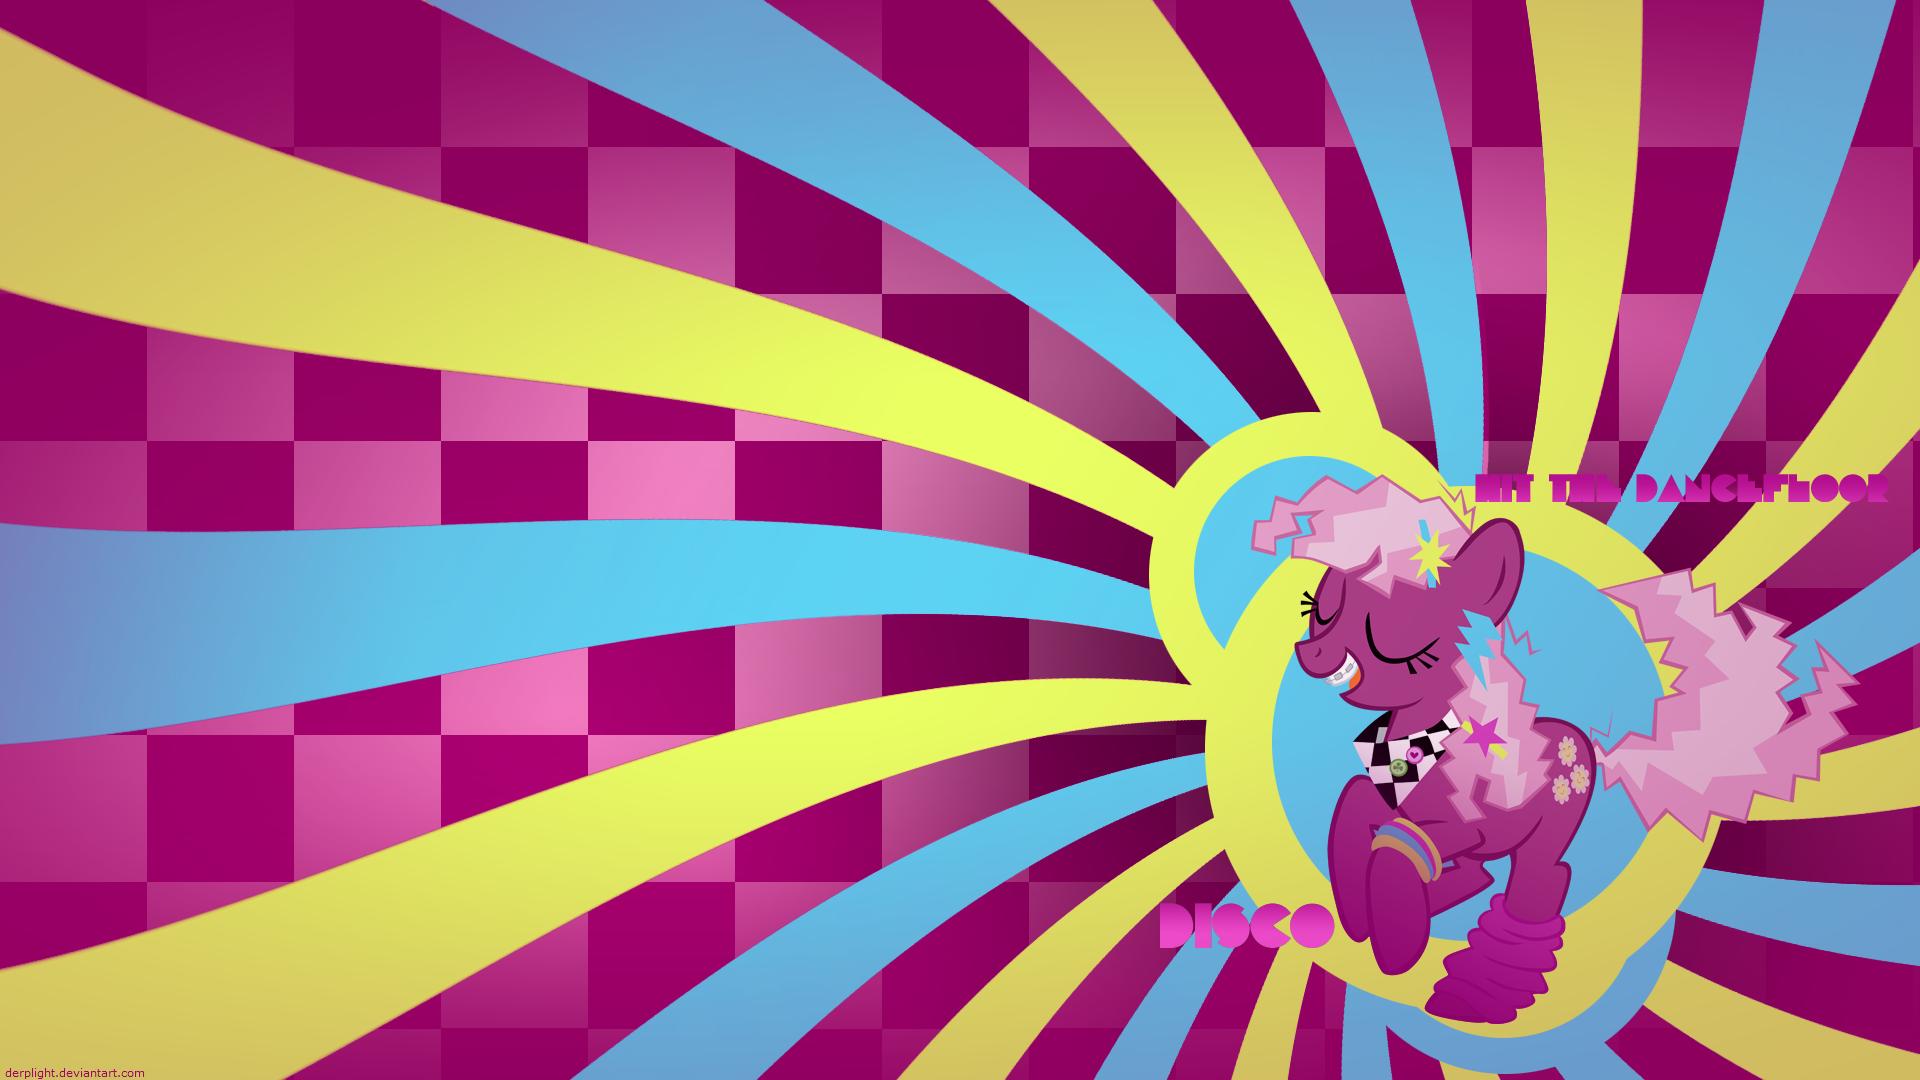 Disco: Hit the Dancefloor (Retro Cheerilee) by DerpLight and ShelltoonTV